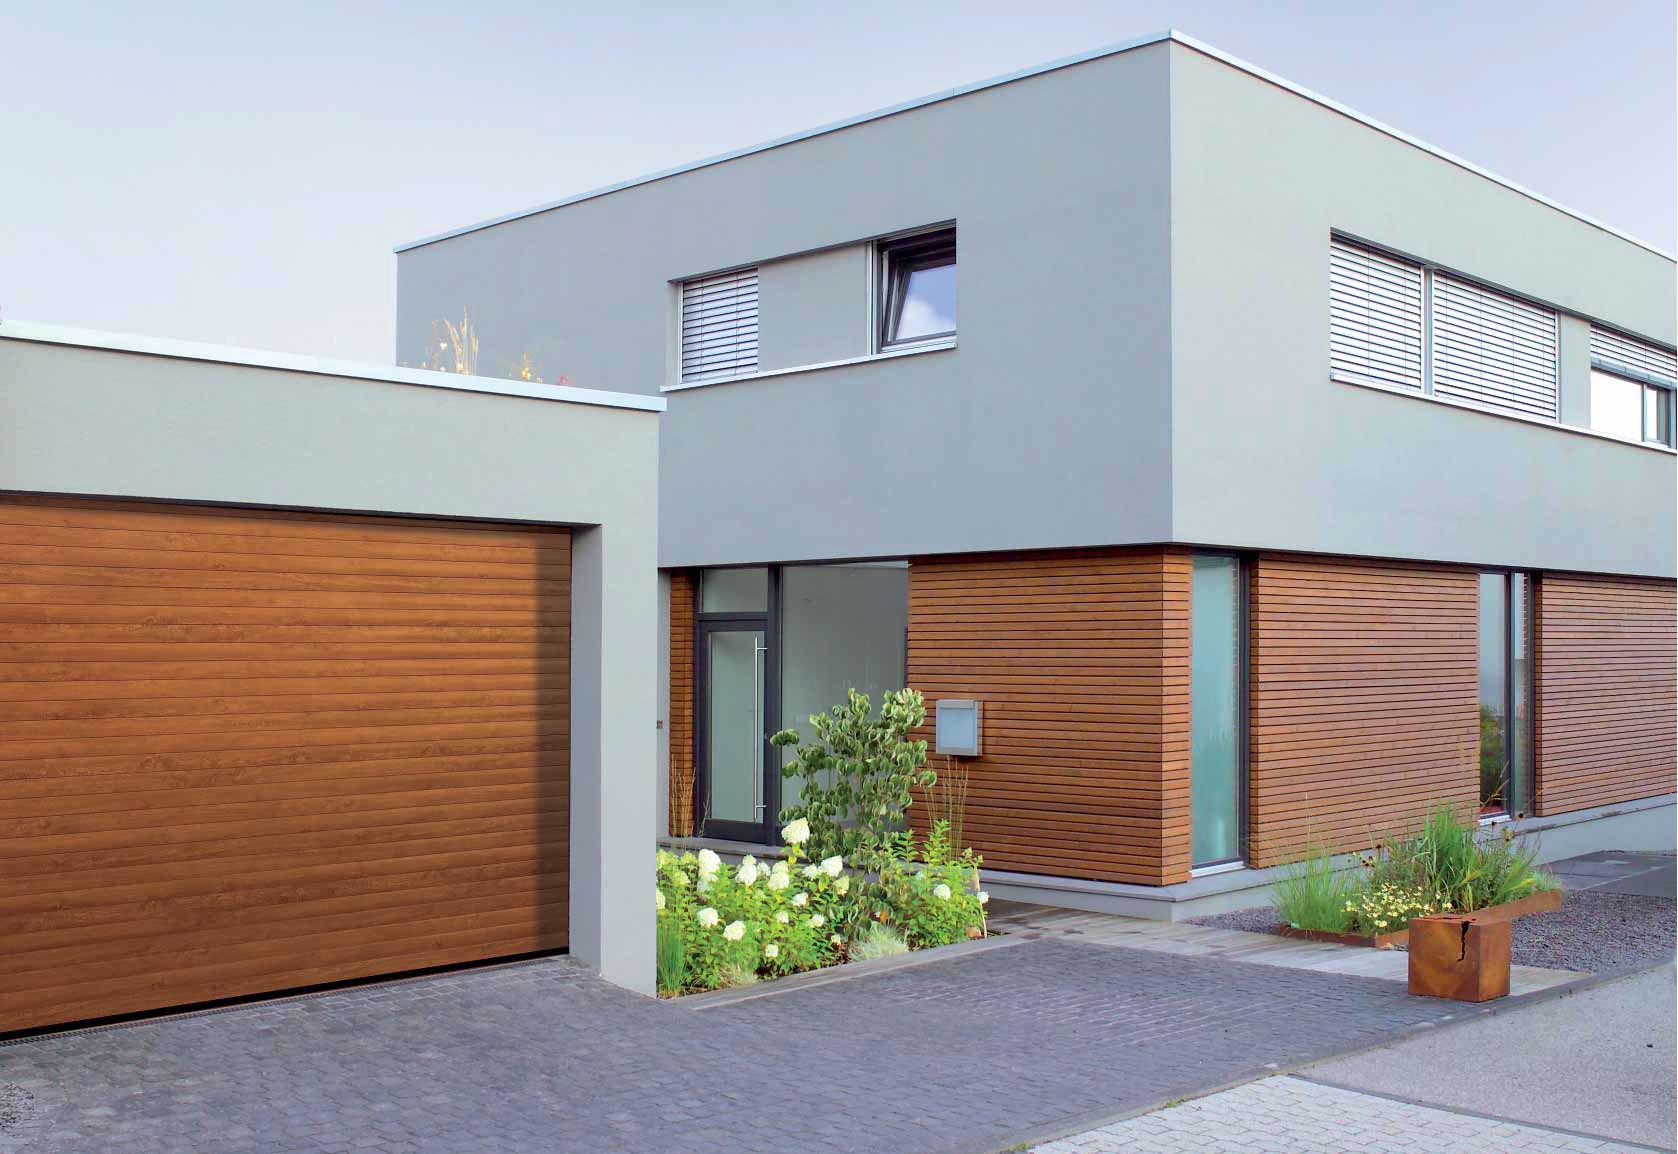 porte-garage-enroulable-aluminium-2621-3653711